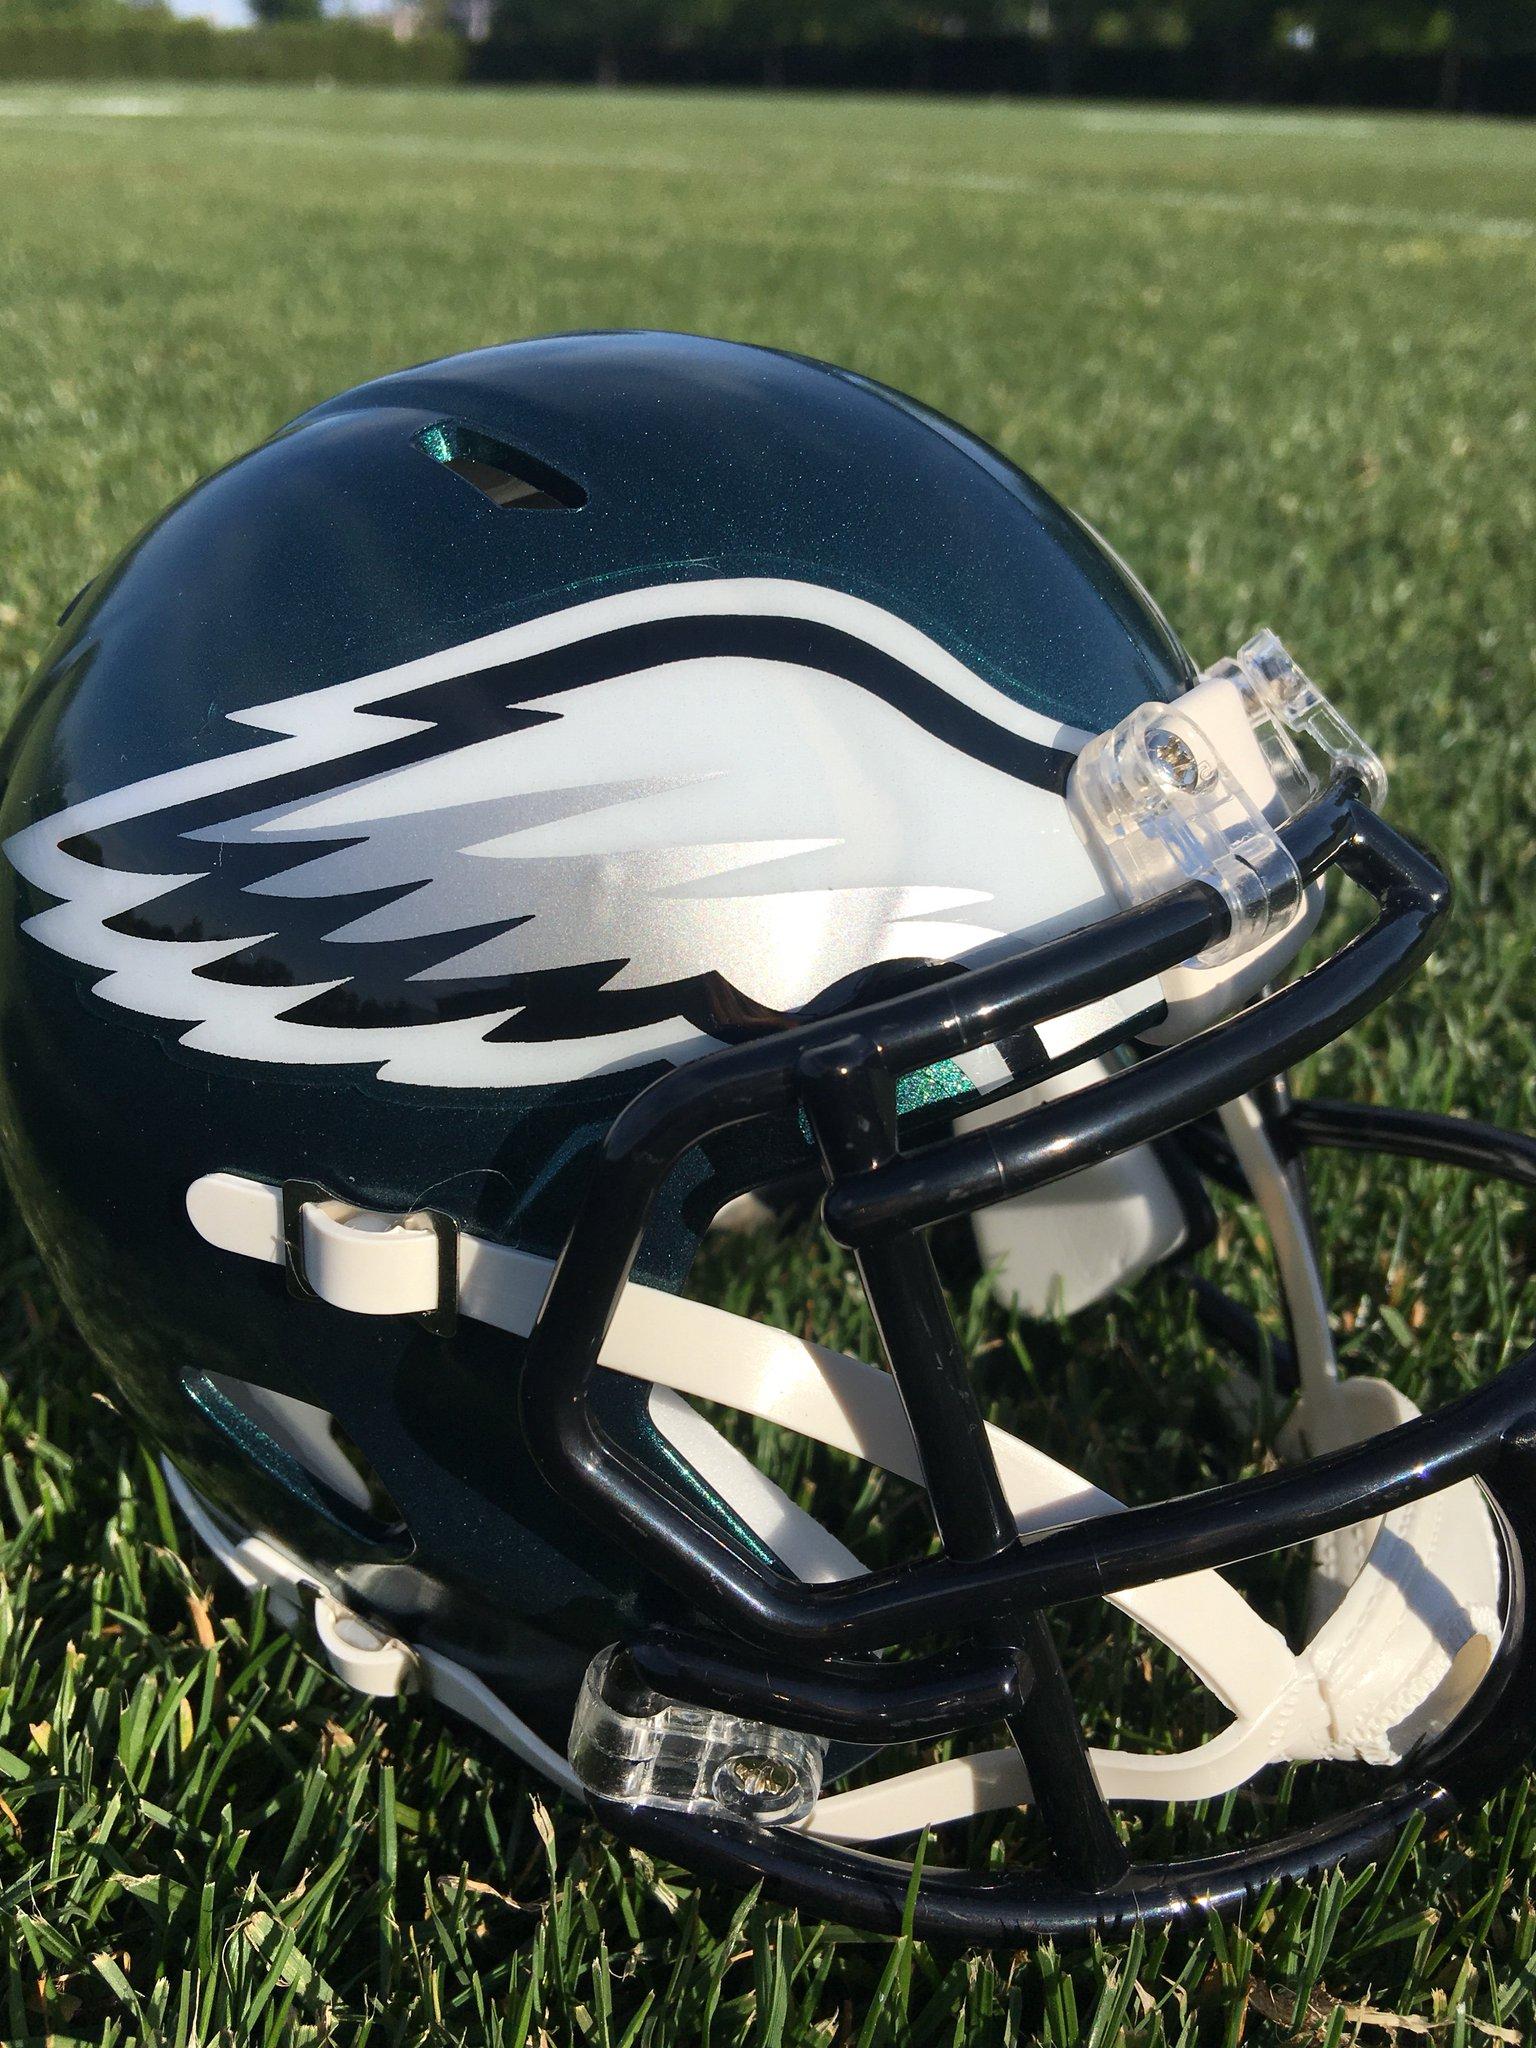 Getting the helmets ready for the new season. #BowWowChallenge https://t.co/2tpq03VV3u